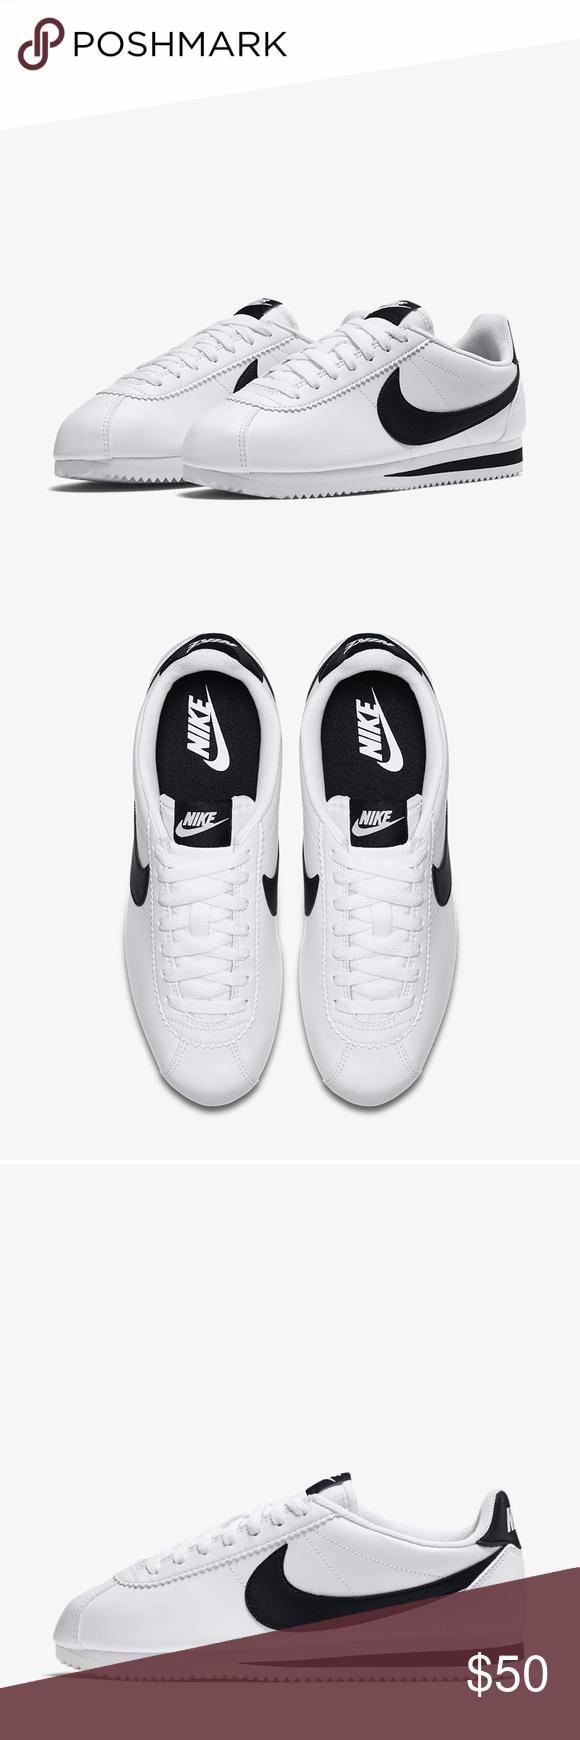 0dcf0f296c951c Nike Cortez